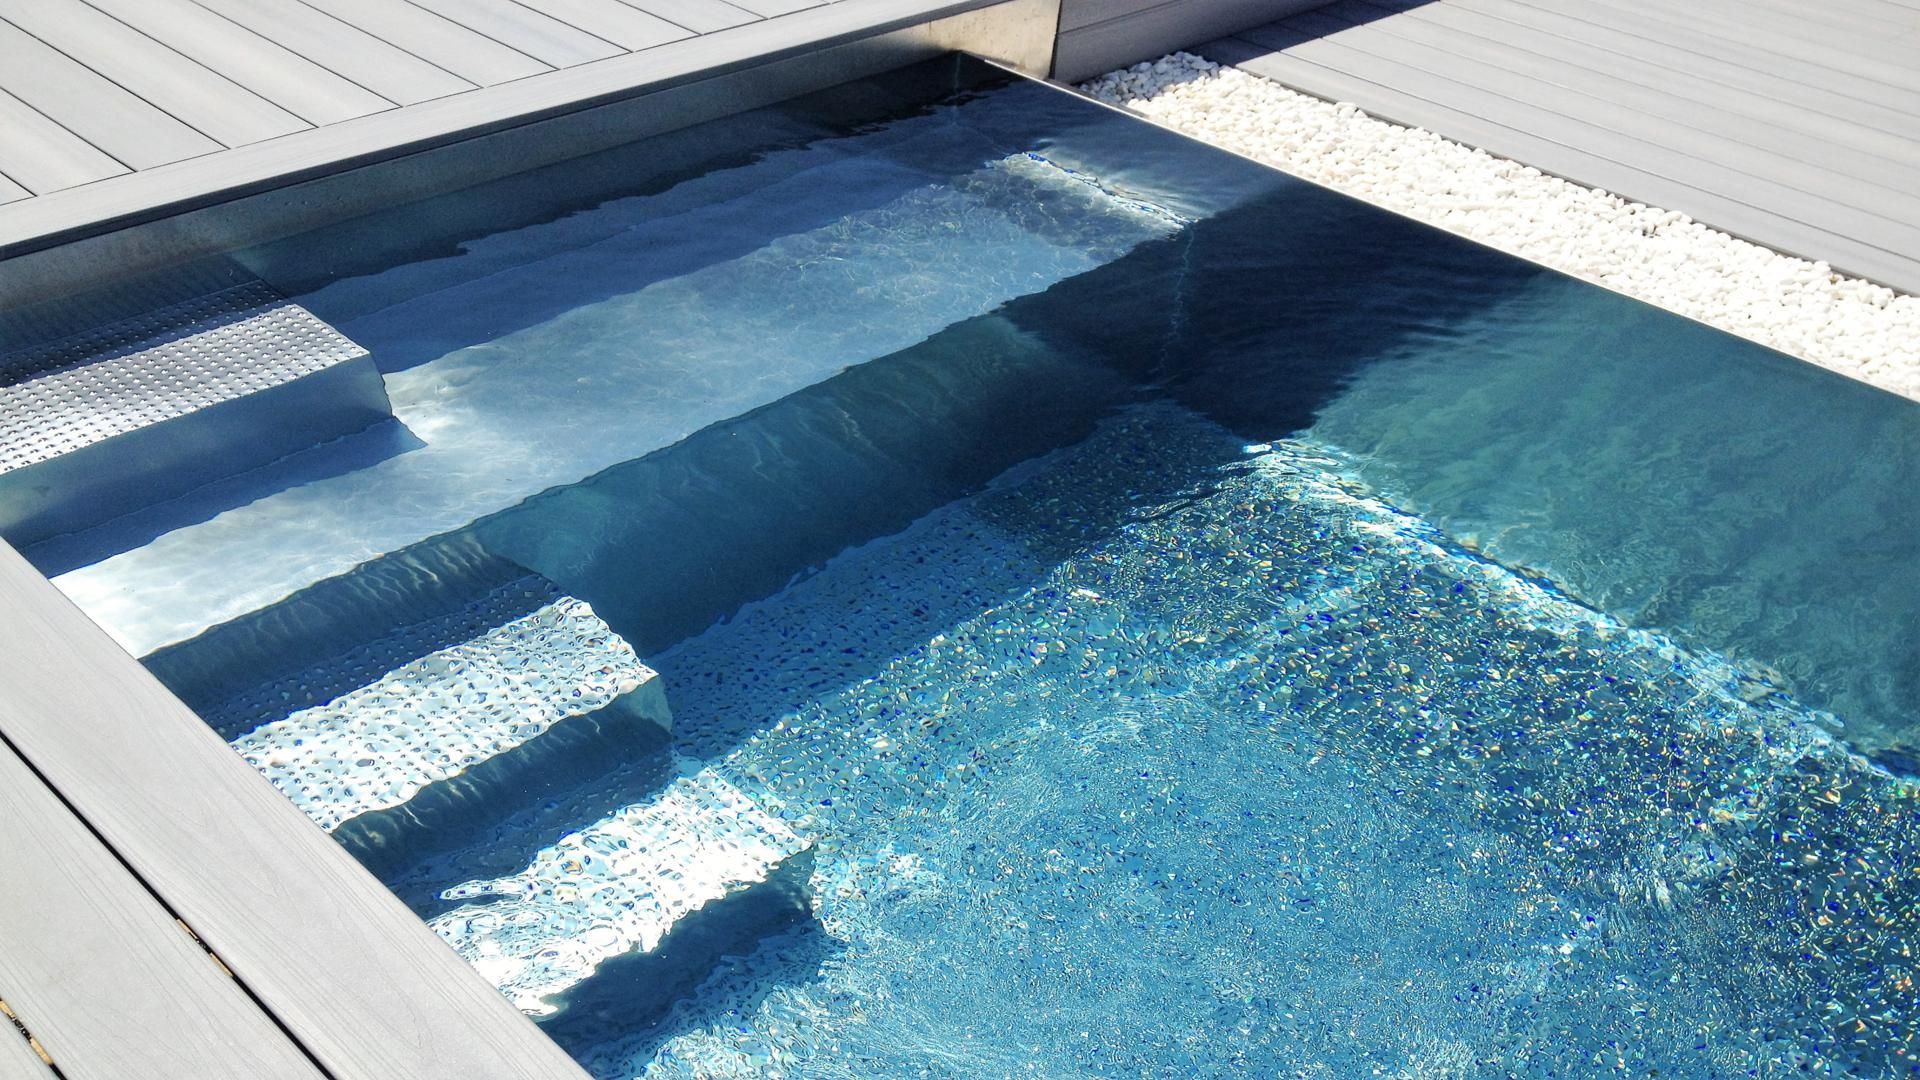 piscinas de acero inoxidable | recoder piscines maresme